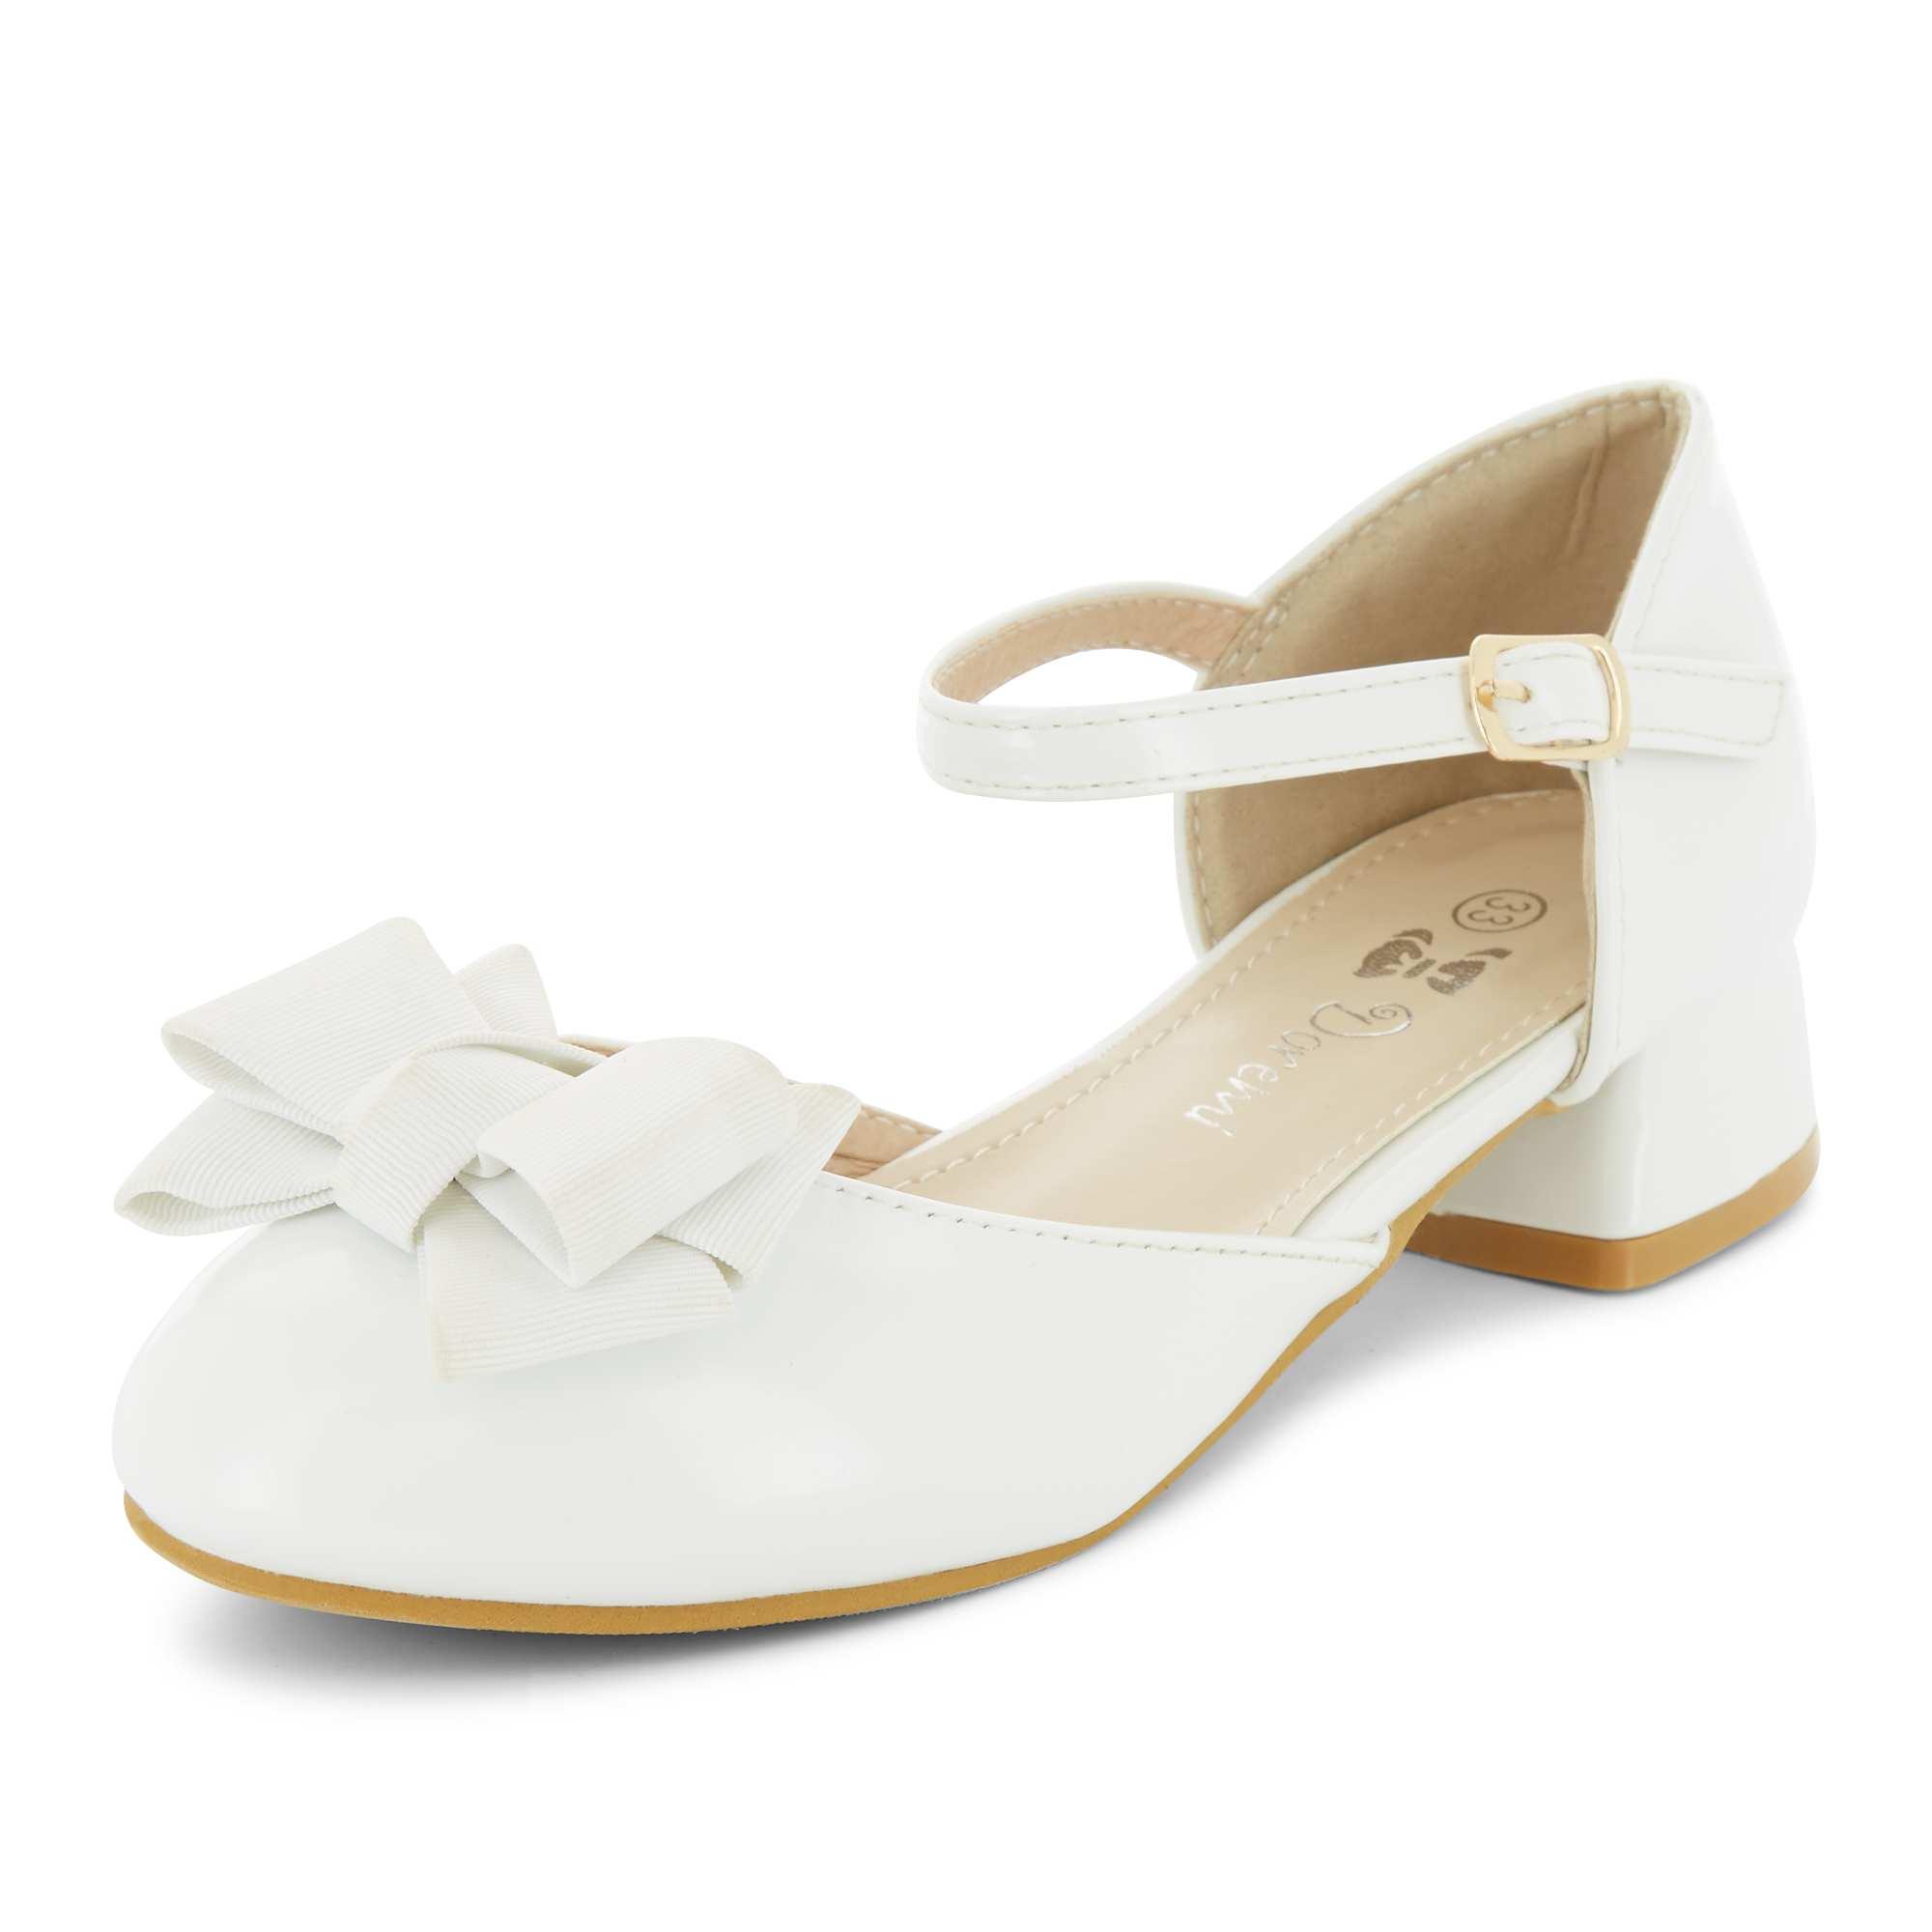 sandales talon fille blanc kiabi 18 00. Black Bedroom Furniture Sets. Home Design Ideas